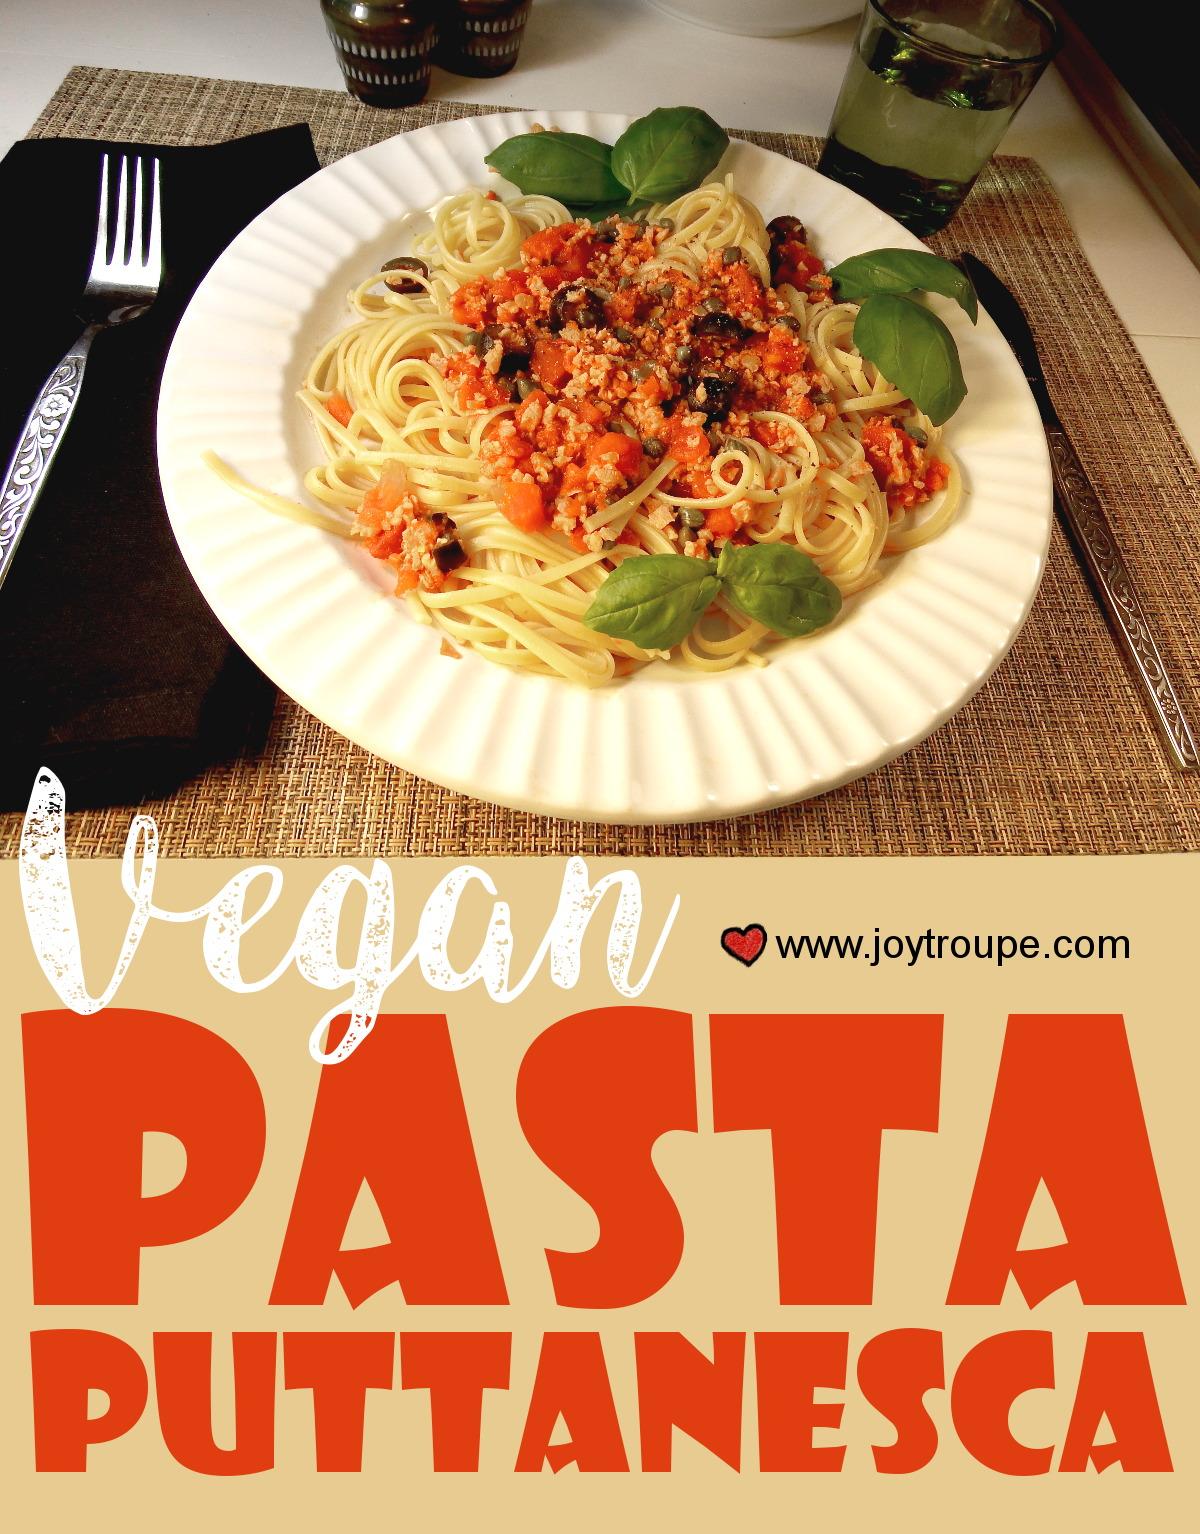 vegan pasta puttanesca pin me Joy Makin Mamas